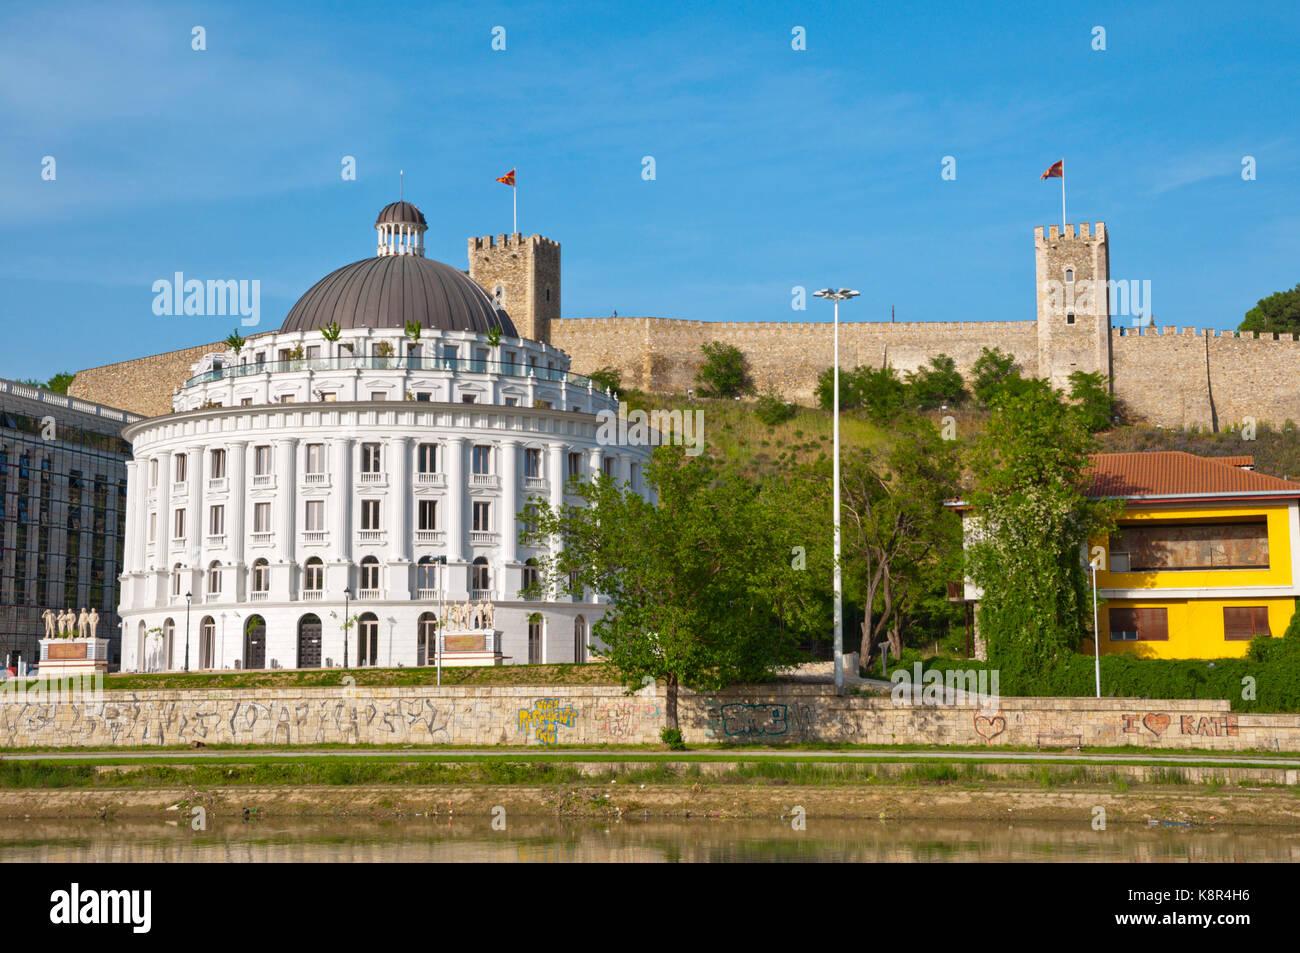 Water Management Building, part of Skopje 2014 project, below Kale fortress, Skopje, Macedonia - Stock Image